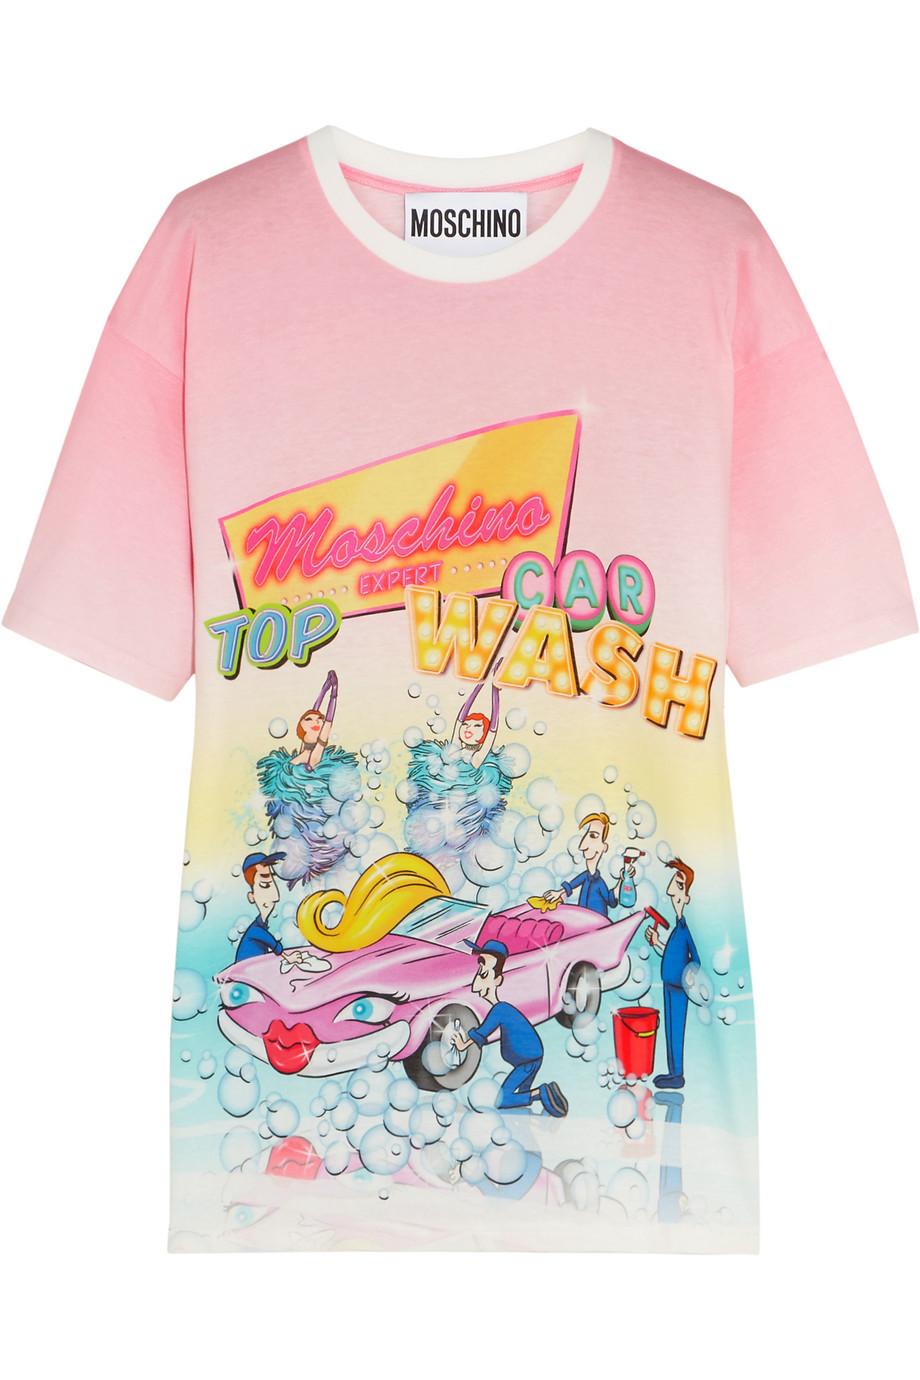 Moschino Printed Cotton-Jersey T-Shirt, Baby Pink, Women's, Size: XS